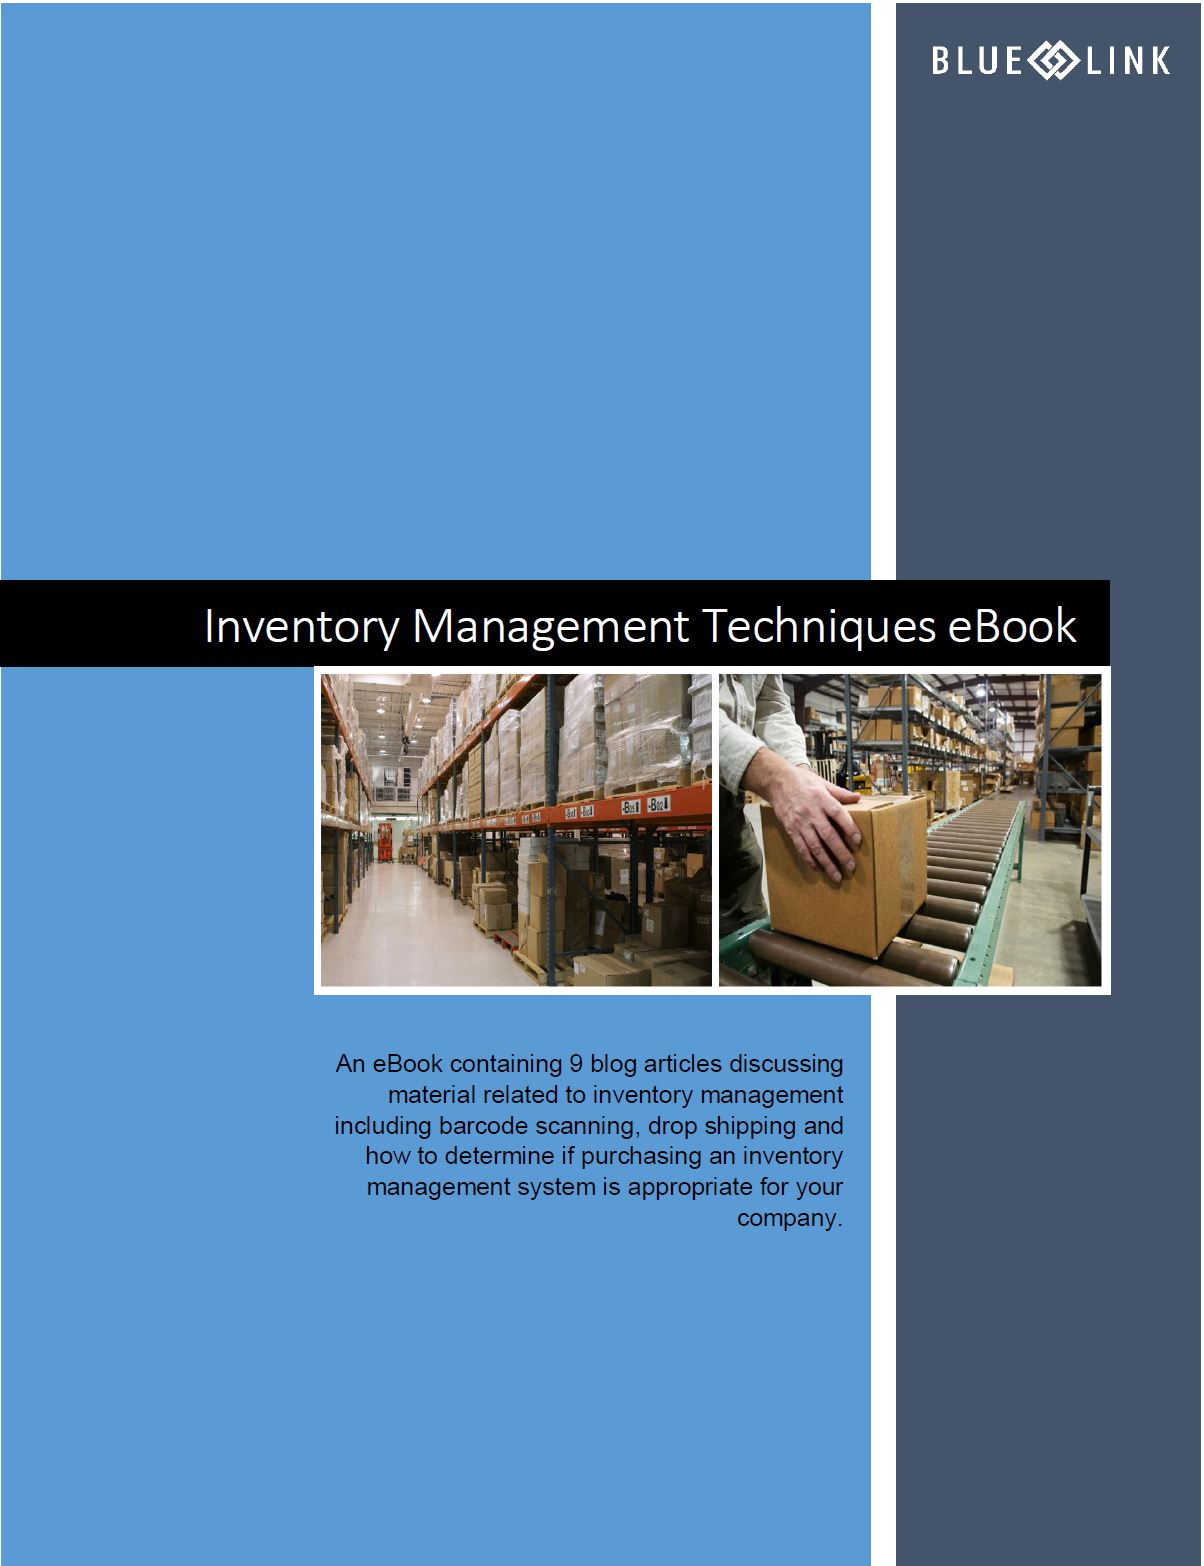 Inventory-ebook-thumbnail.jpg